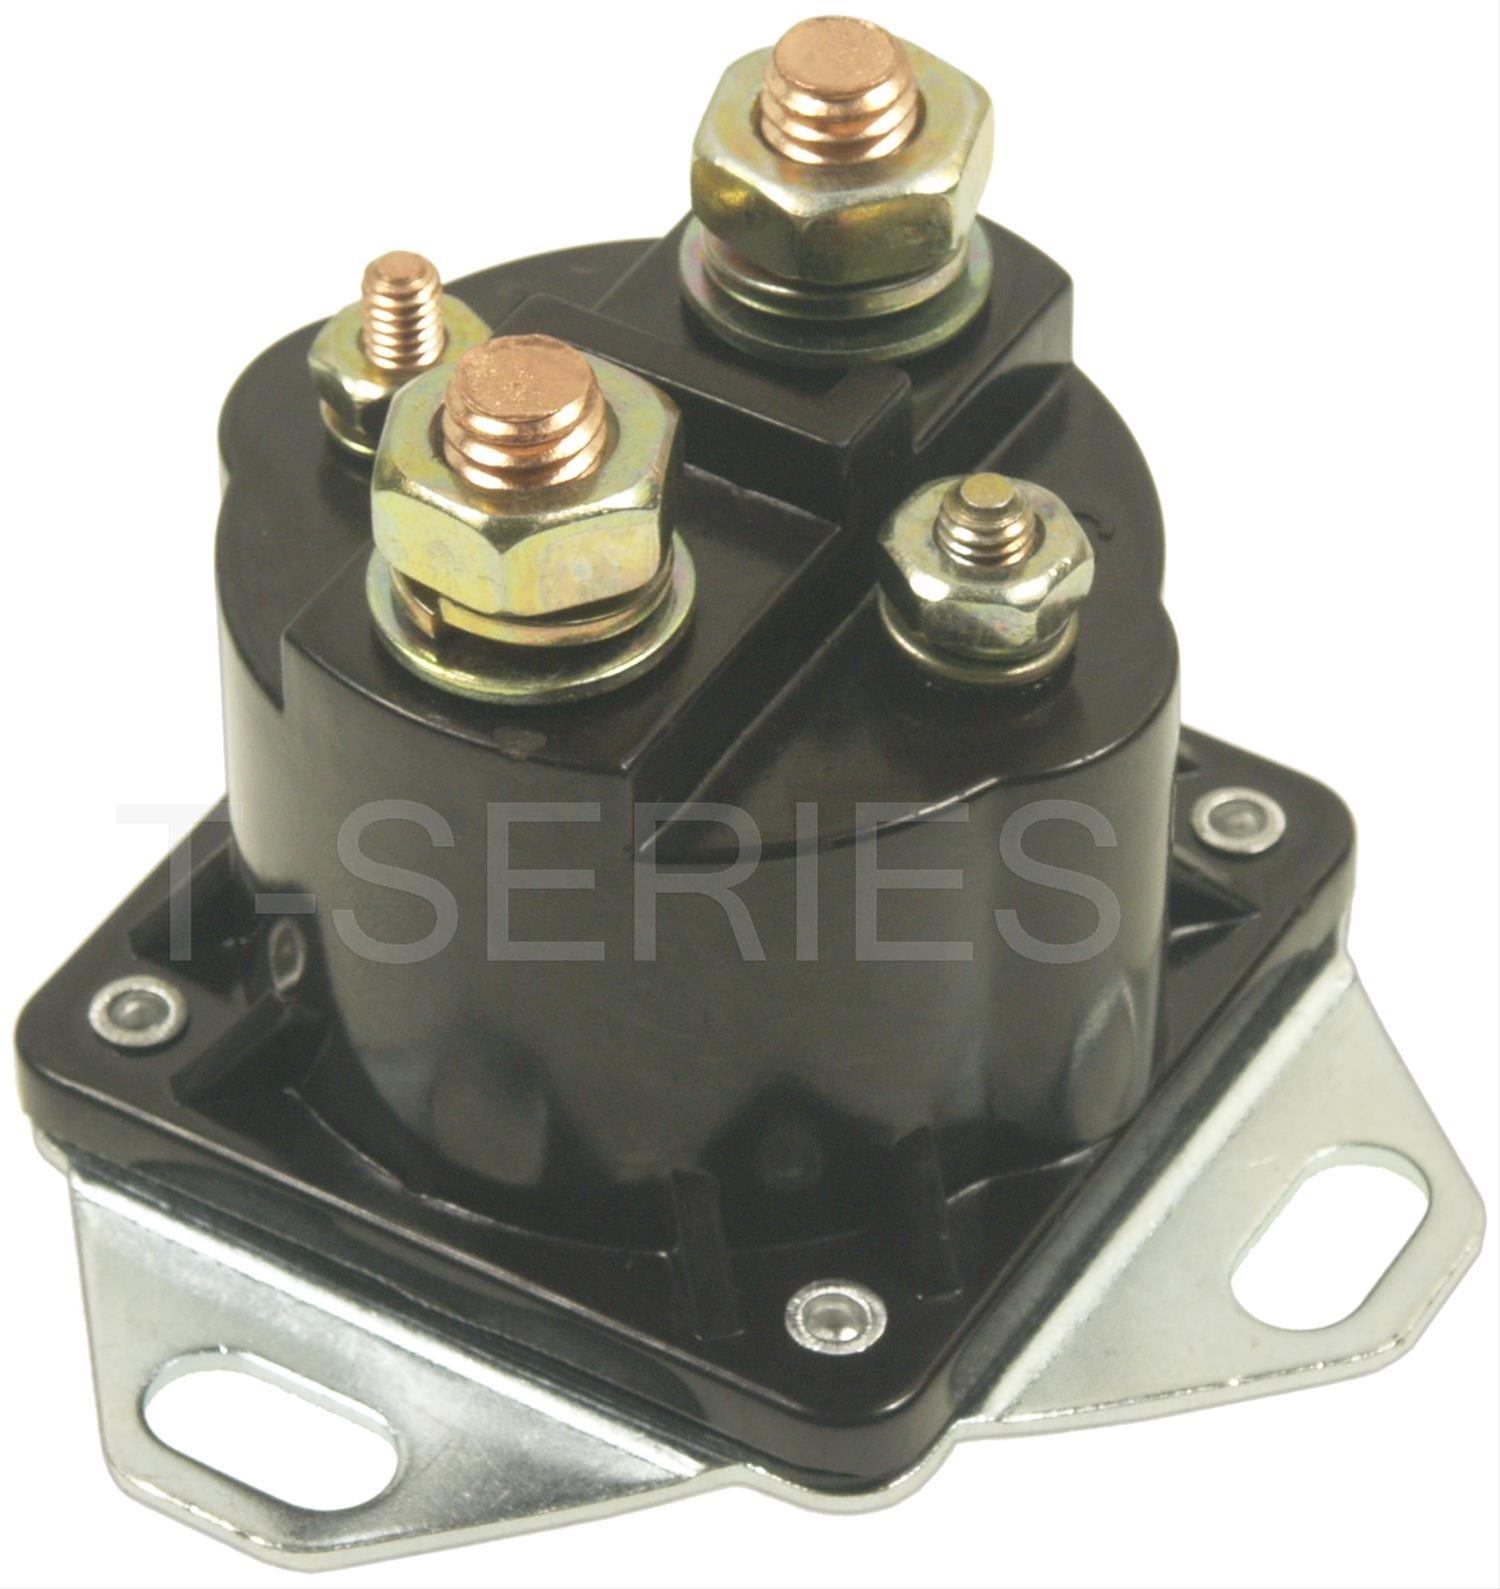 GooDeal Fuel Shut Off Solenoid Switch 6691498 for Bobcat S130 S150 S160 S175 S185 S205 S450 Skid